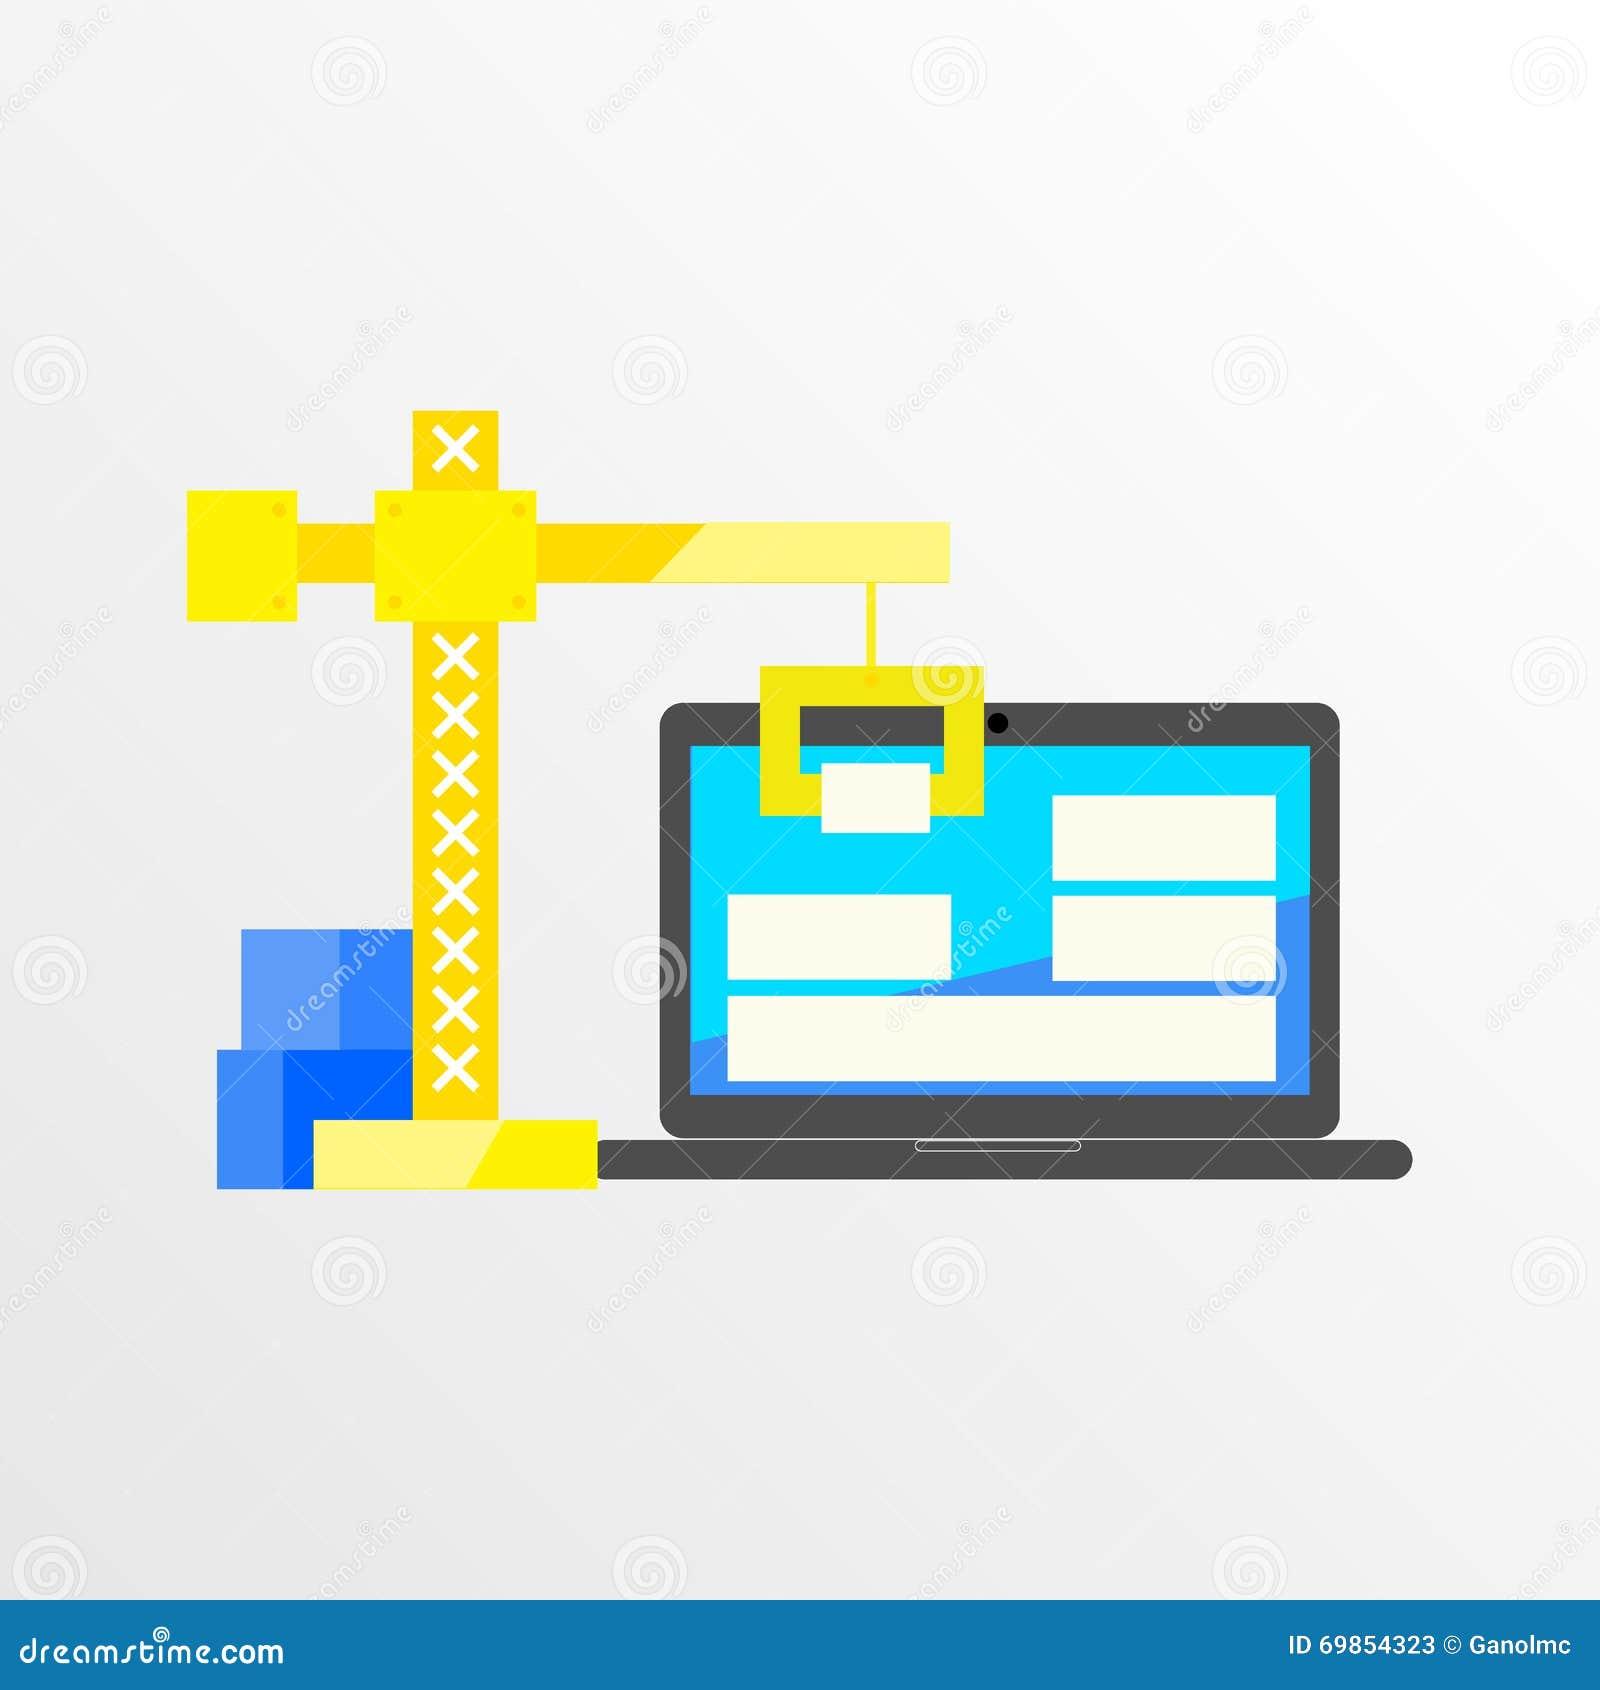 Building designing a website or application flat style Building designing app